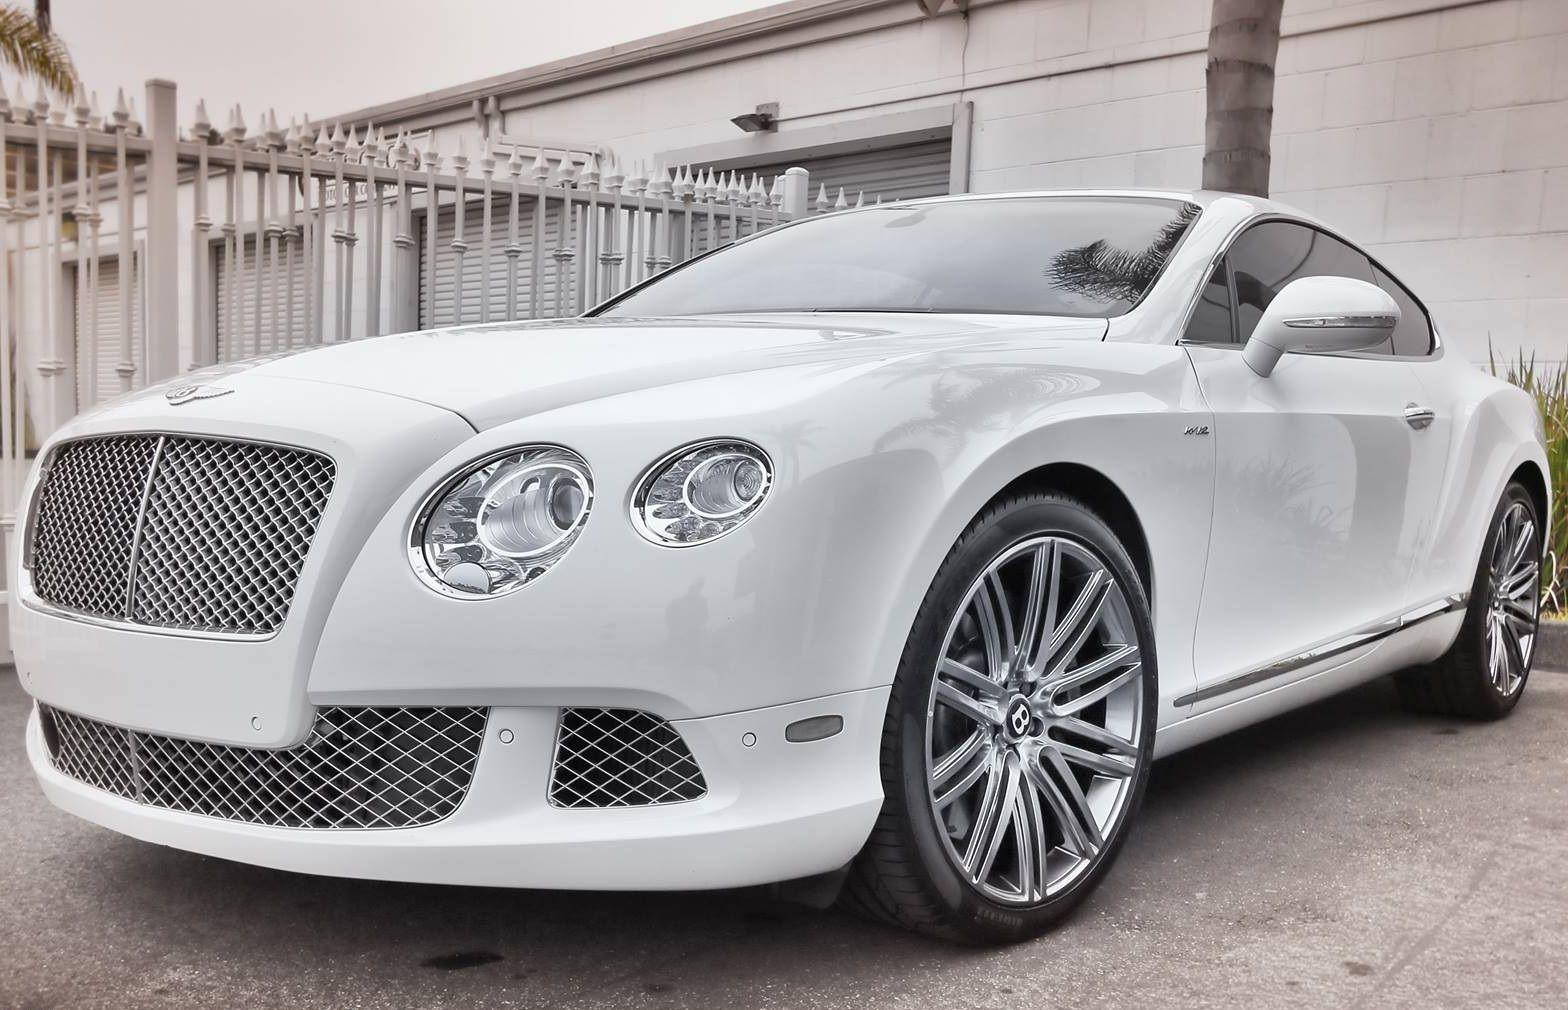 Bentley Continental Gt Carflash With Images Bentley